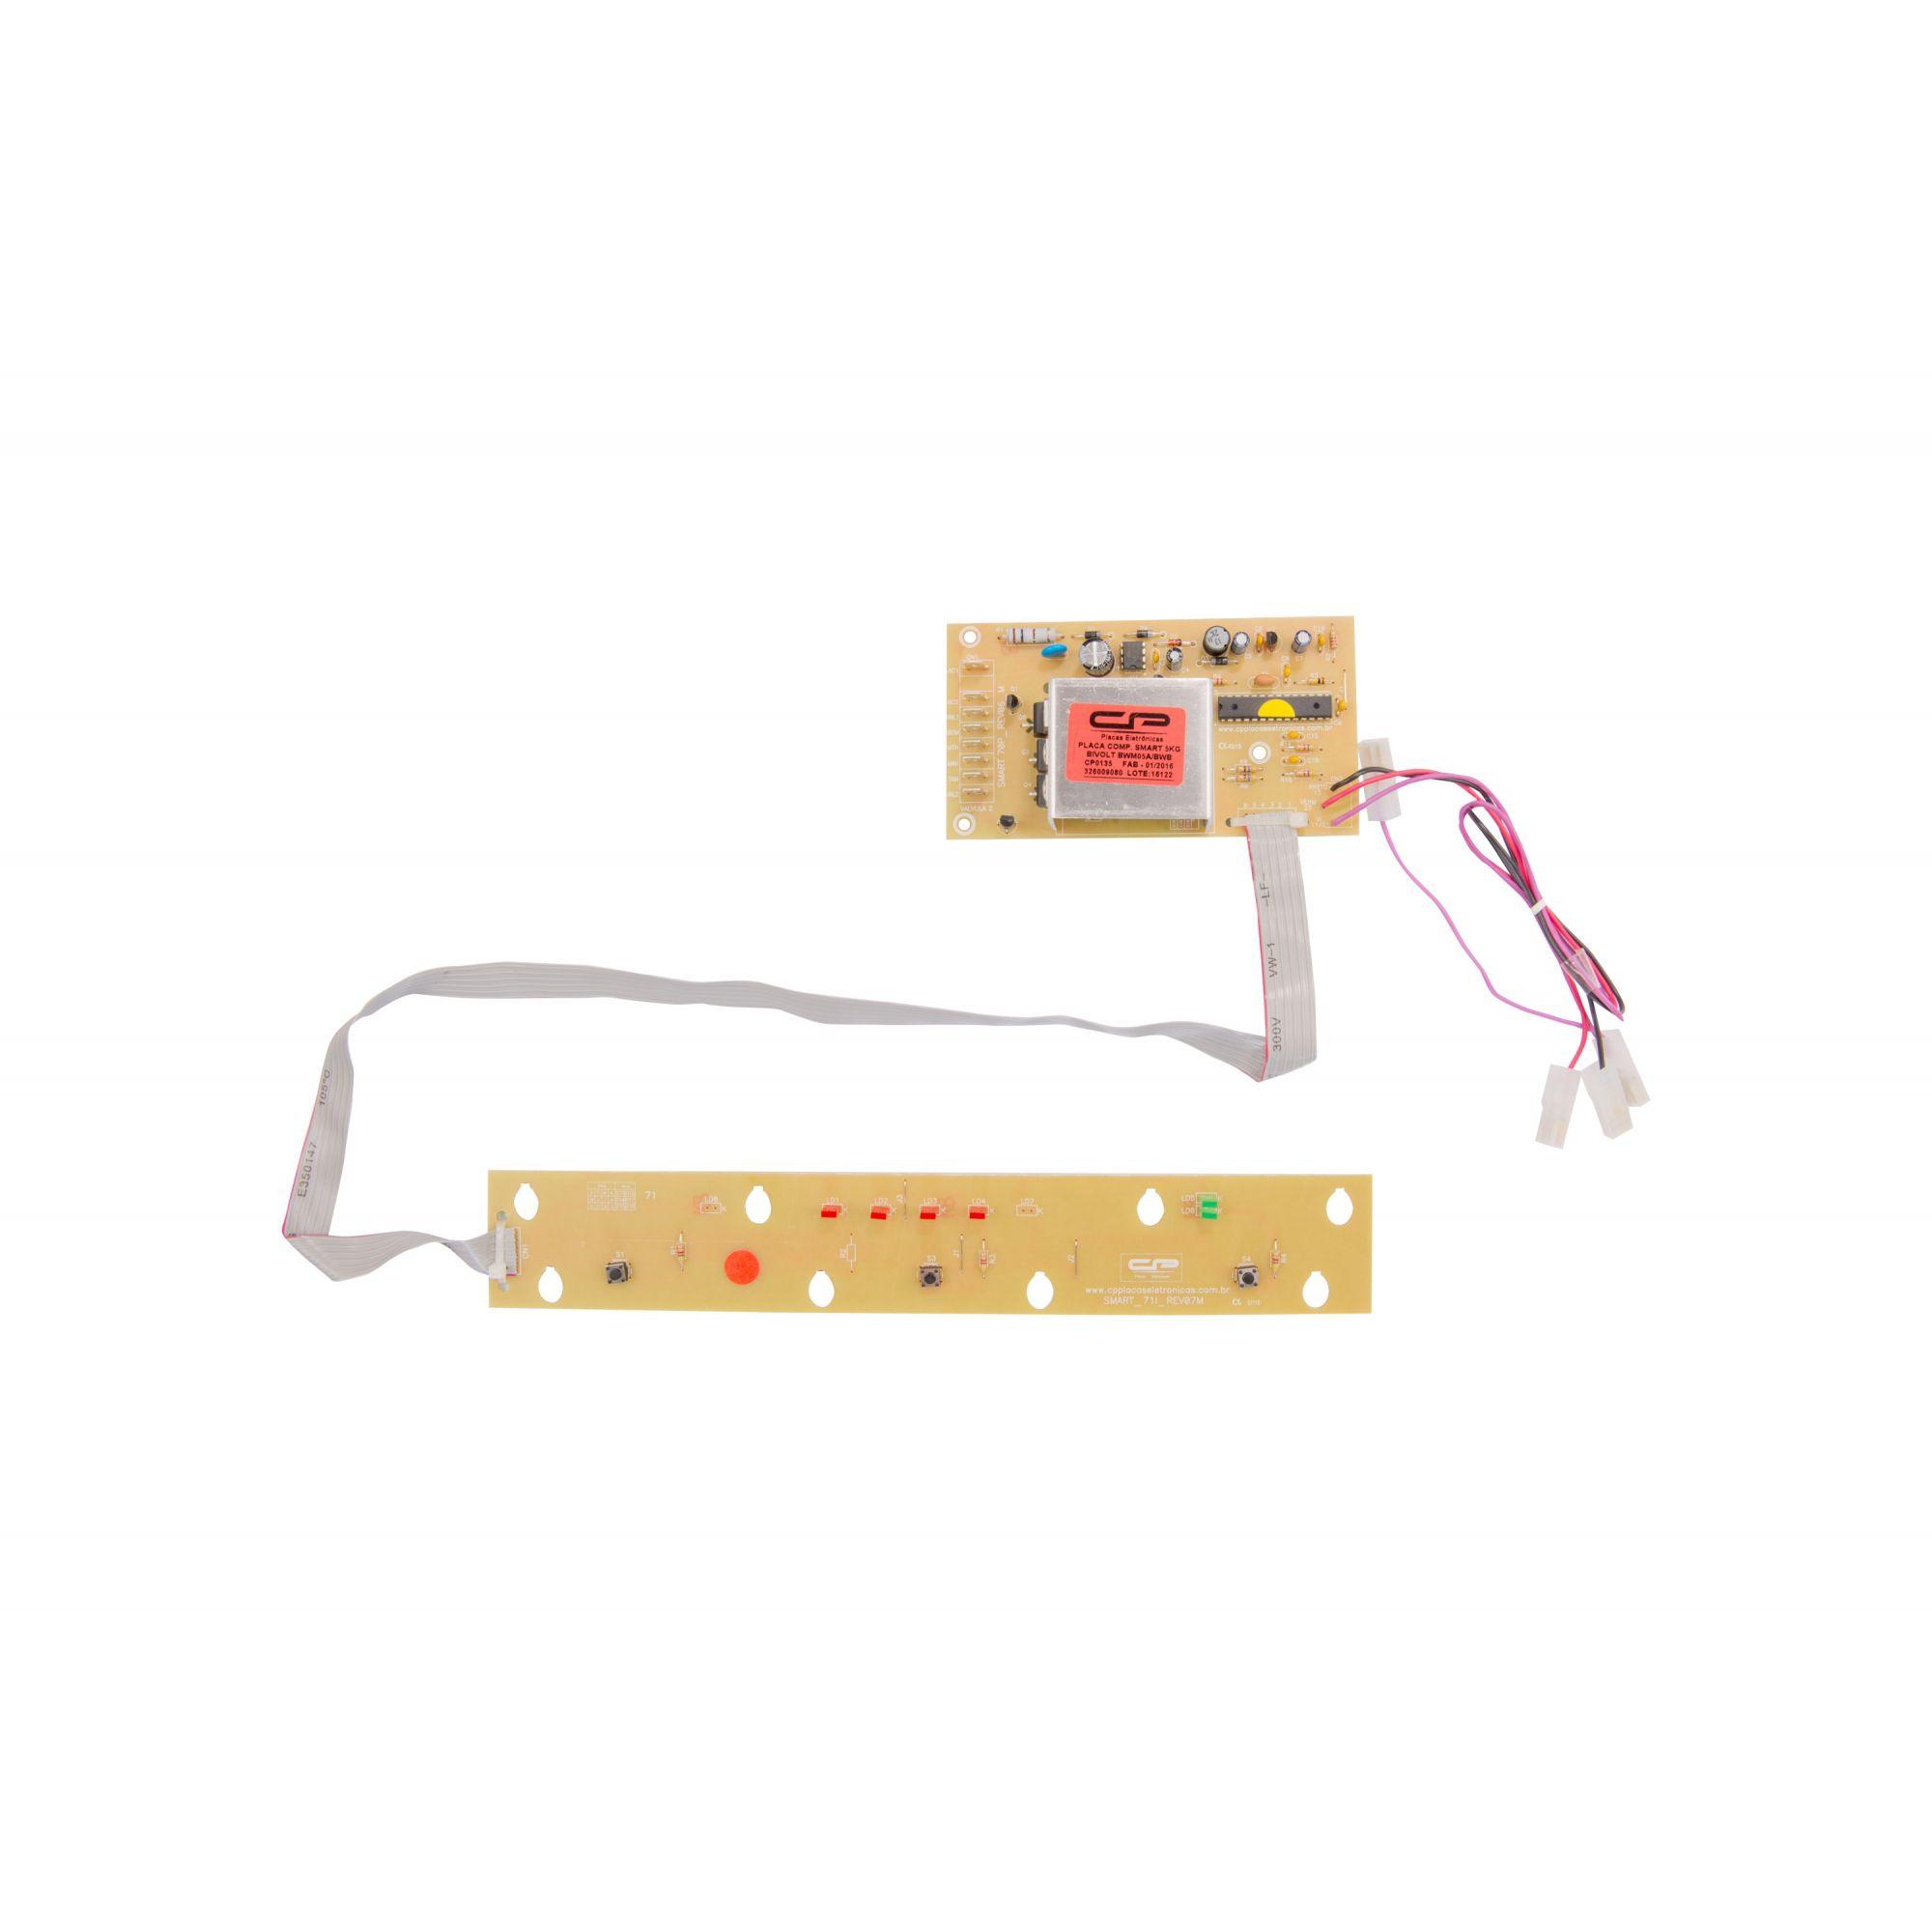 Placa Eletrônica Lavadora Brastemp Smart Bwm05 Bwm06 Bwb22 05kg Bivolt Cp (CP0135)